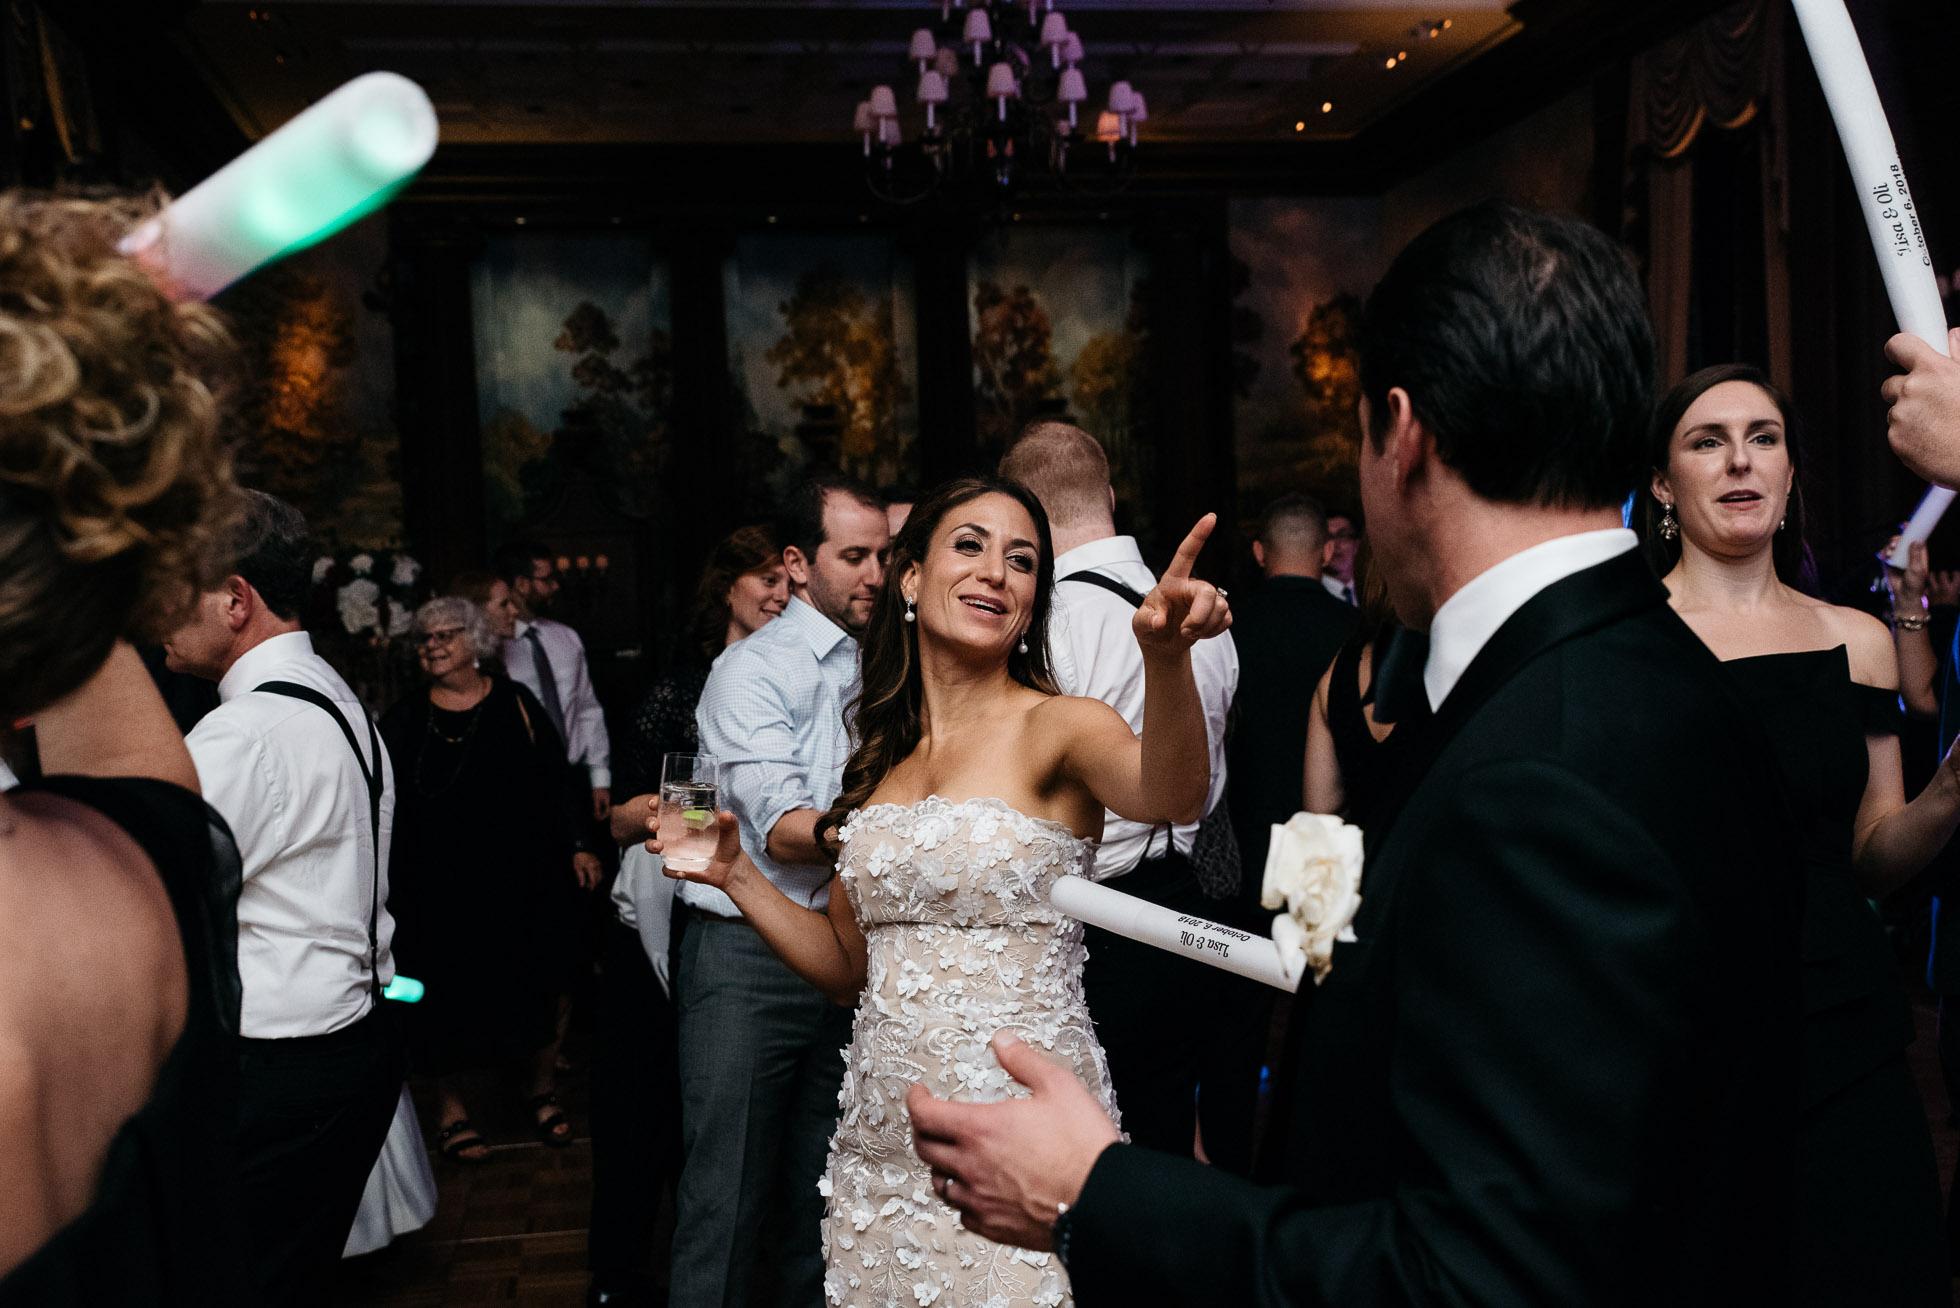 Duquesne Club Pittsburgh PA, Mariah Fisher, reception dancing, party-14.jpg